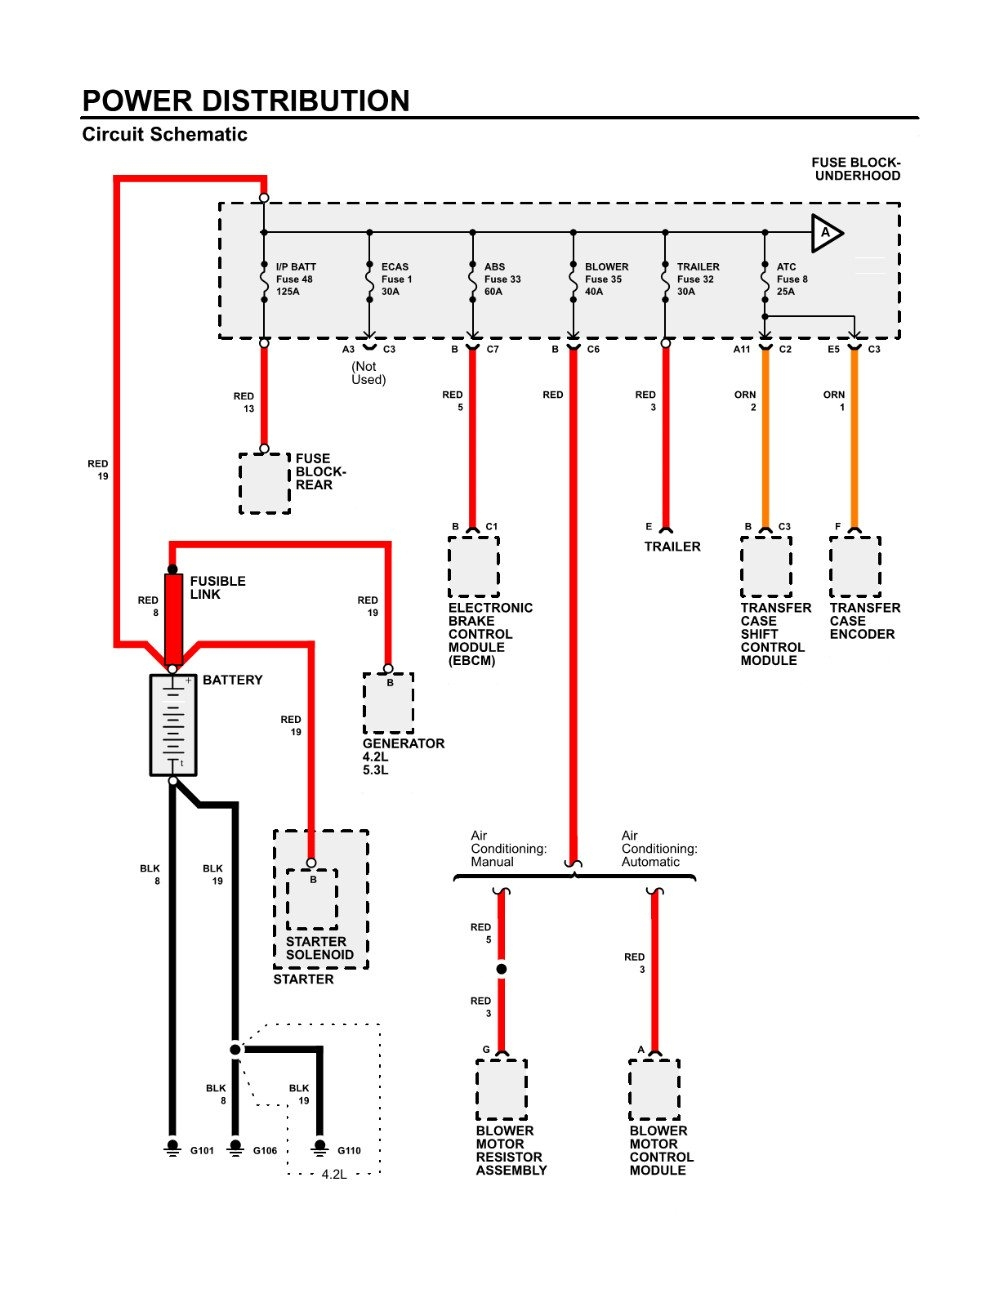 Blower Motor Resistor Wiring Diagram | Wiring Library - 2005 Chevy Silverado Blower Motor Resistor Wiring Diagram